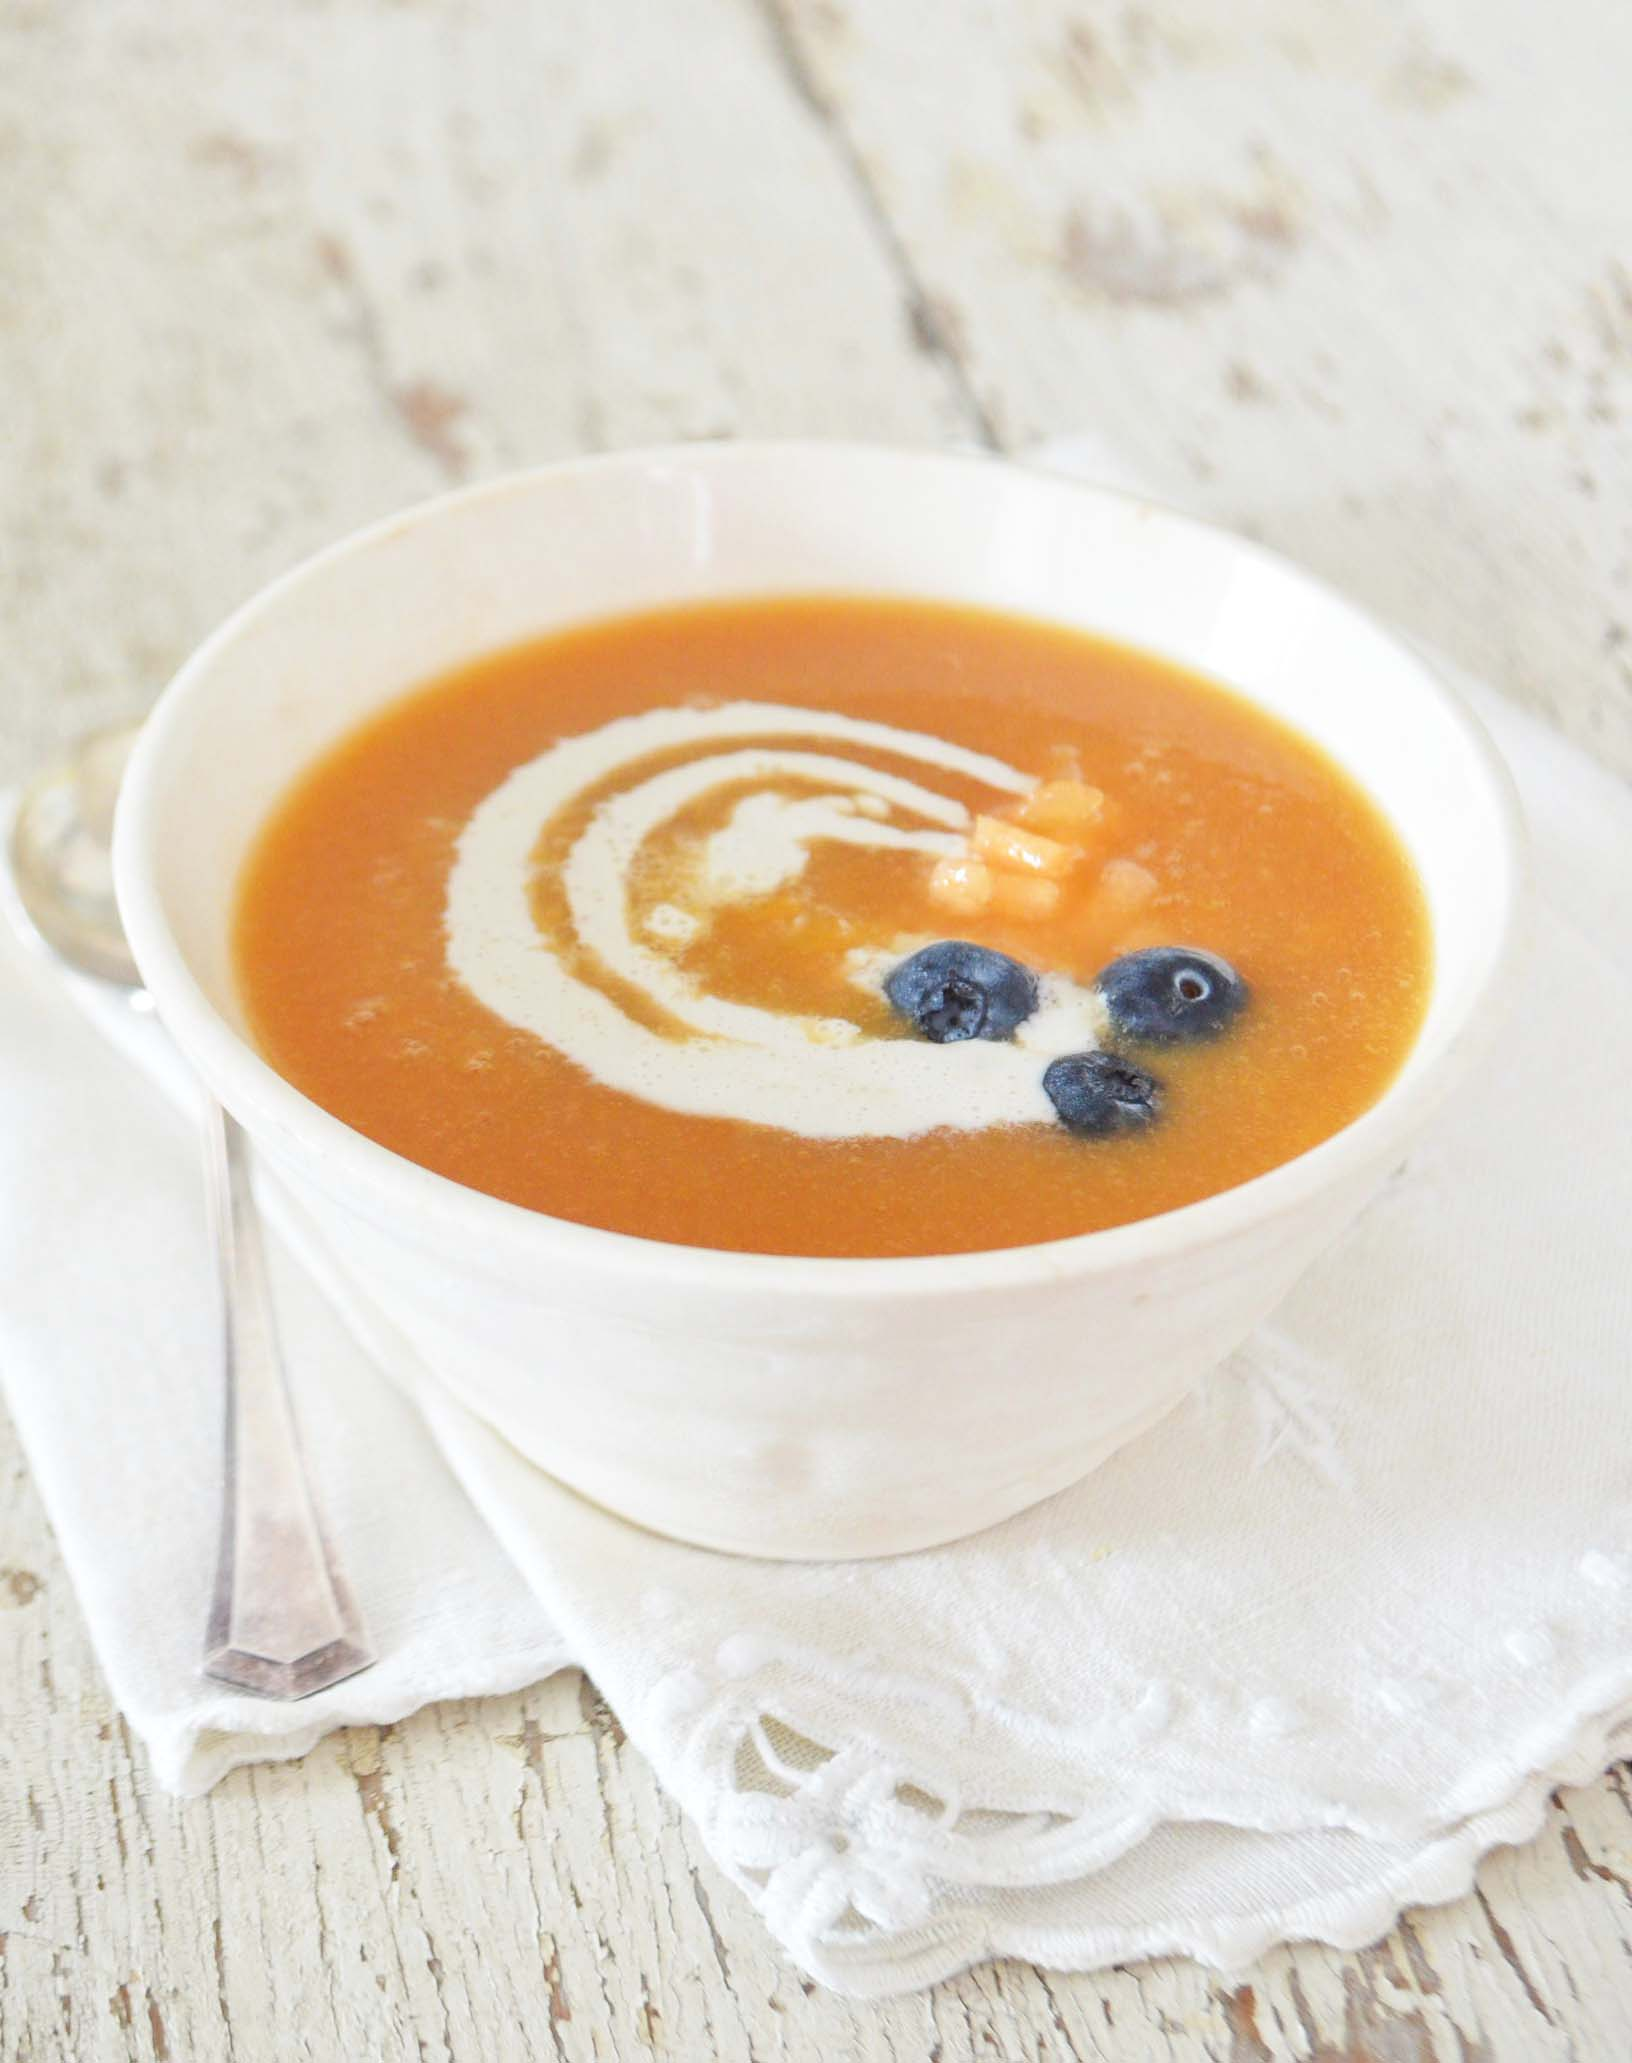 Vegan Chilled Cantaloupe Soup Phoebe S Pure Food Lemon juice 1 1/2 c. chilled cantaloupe soup